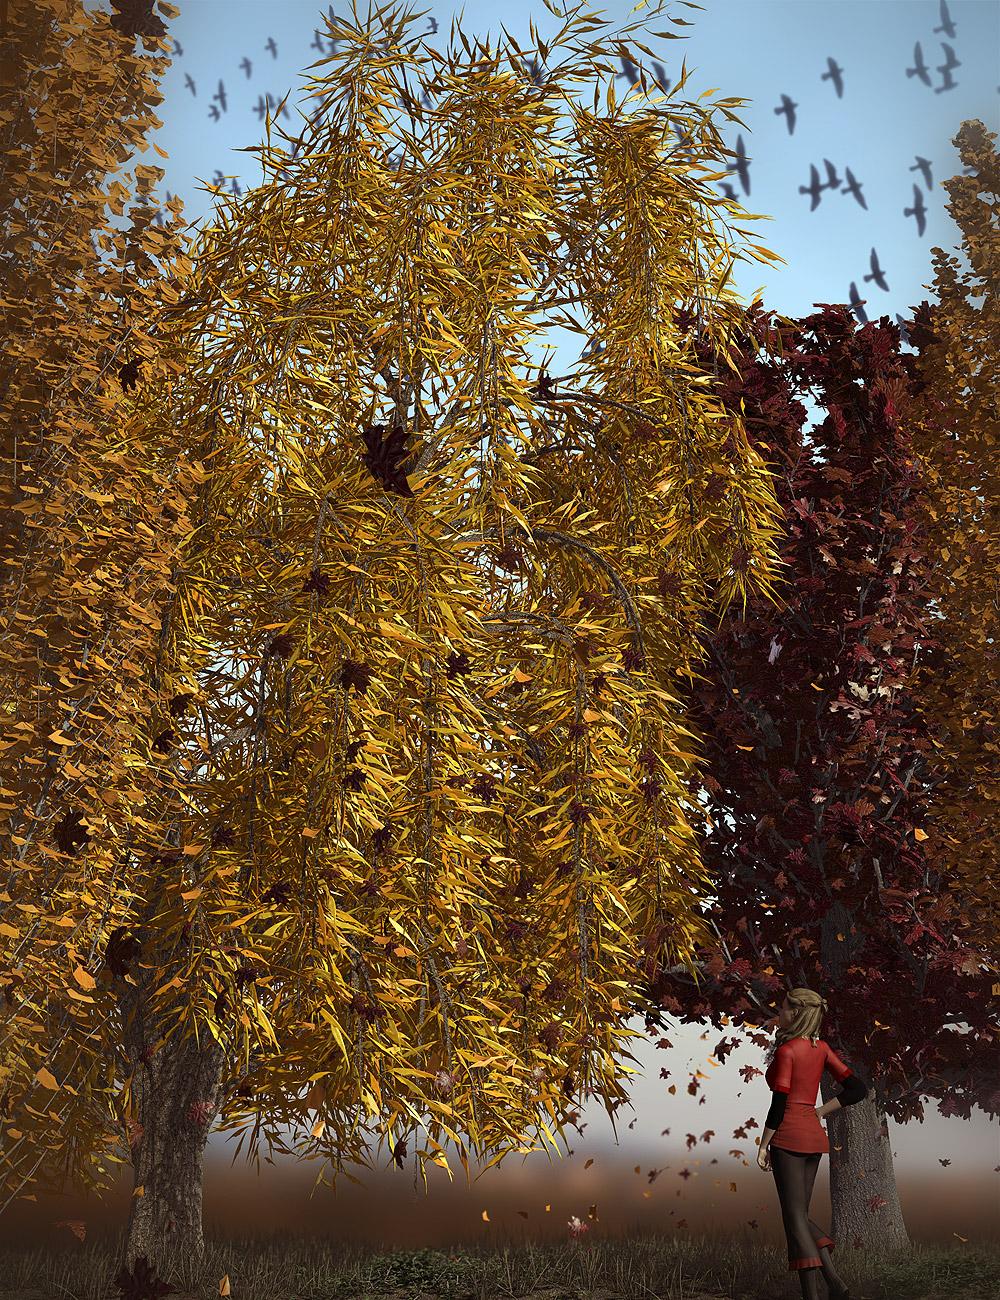 Orestes Trees Vol. 1 by: Orestes Graphics, 3D Models by Daz 3D